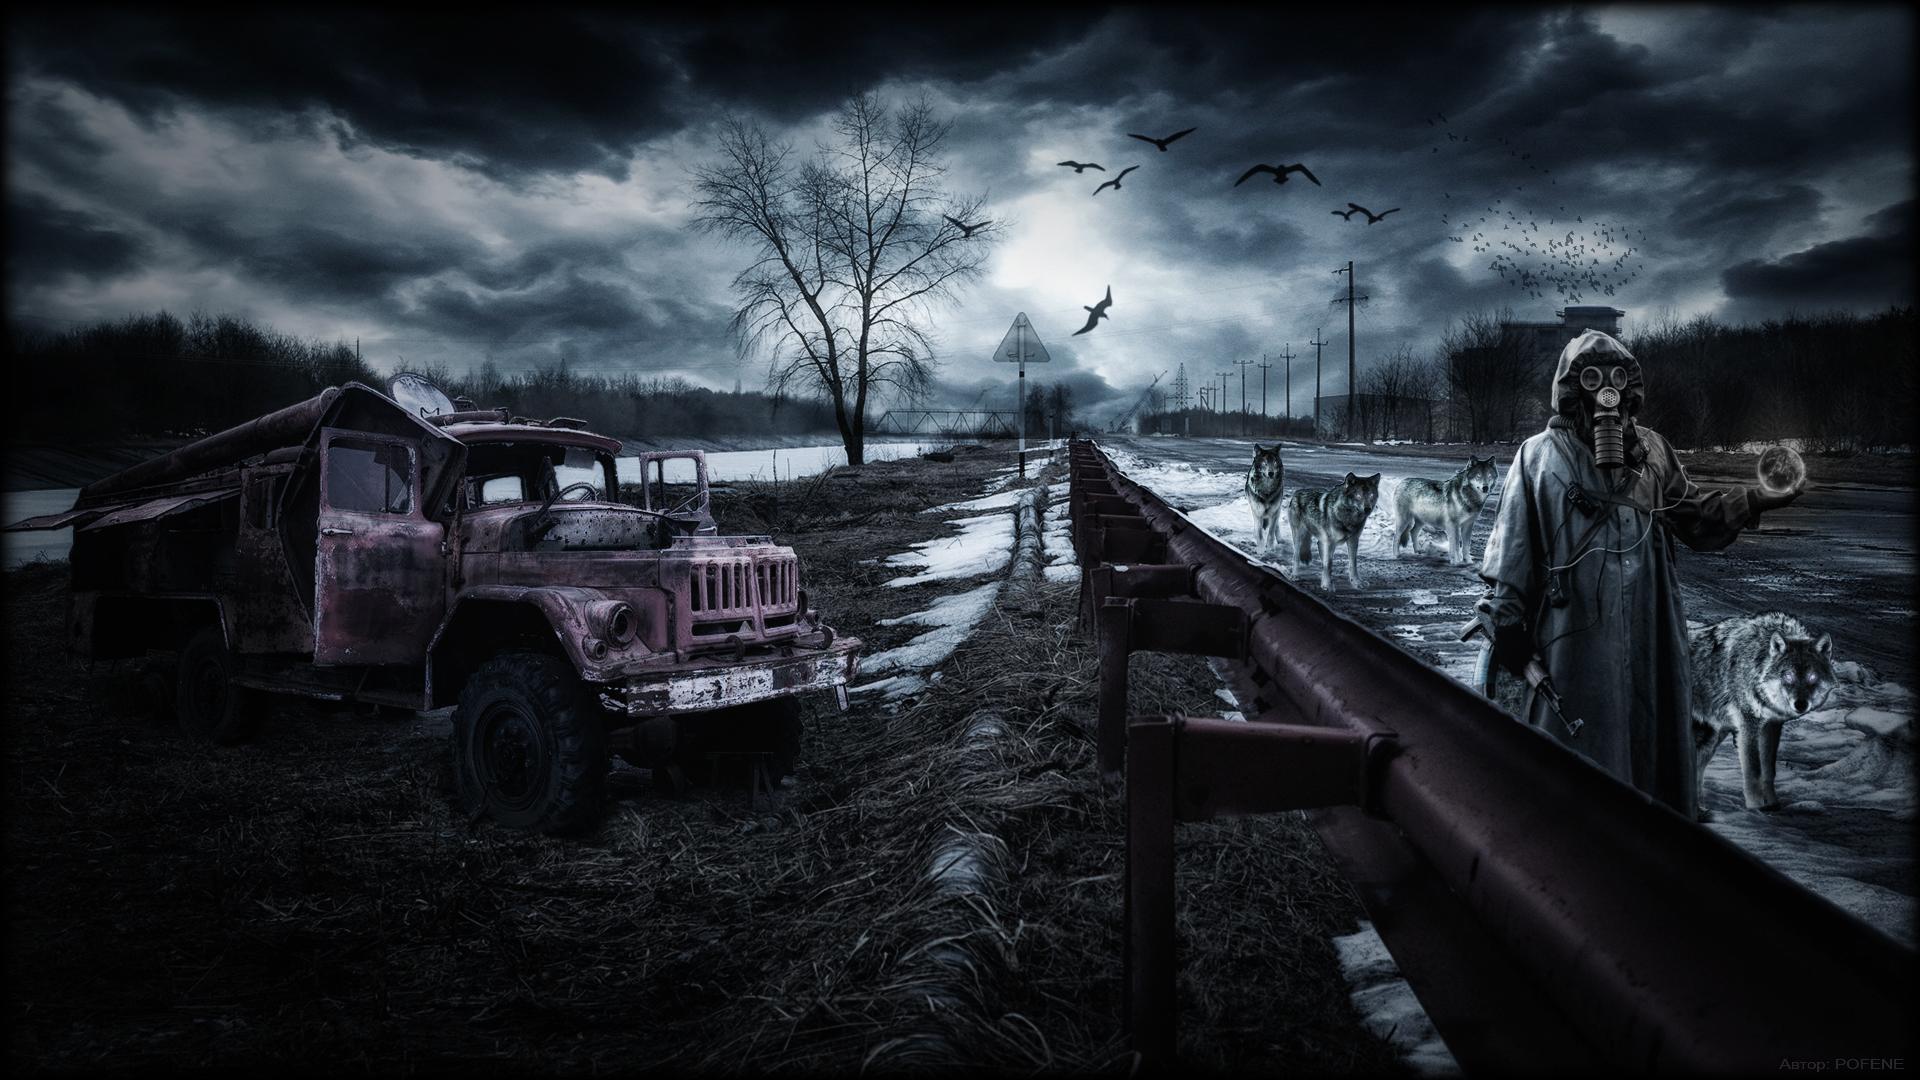 rain area night wolf wolves apocalyptic dark wallpaper background 1920x1080